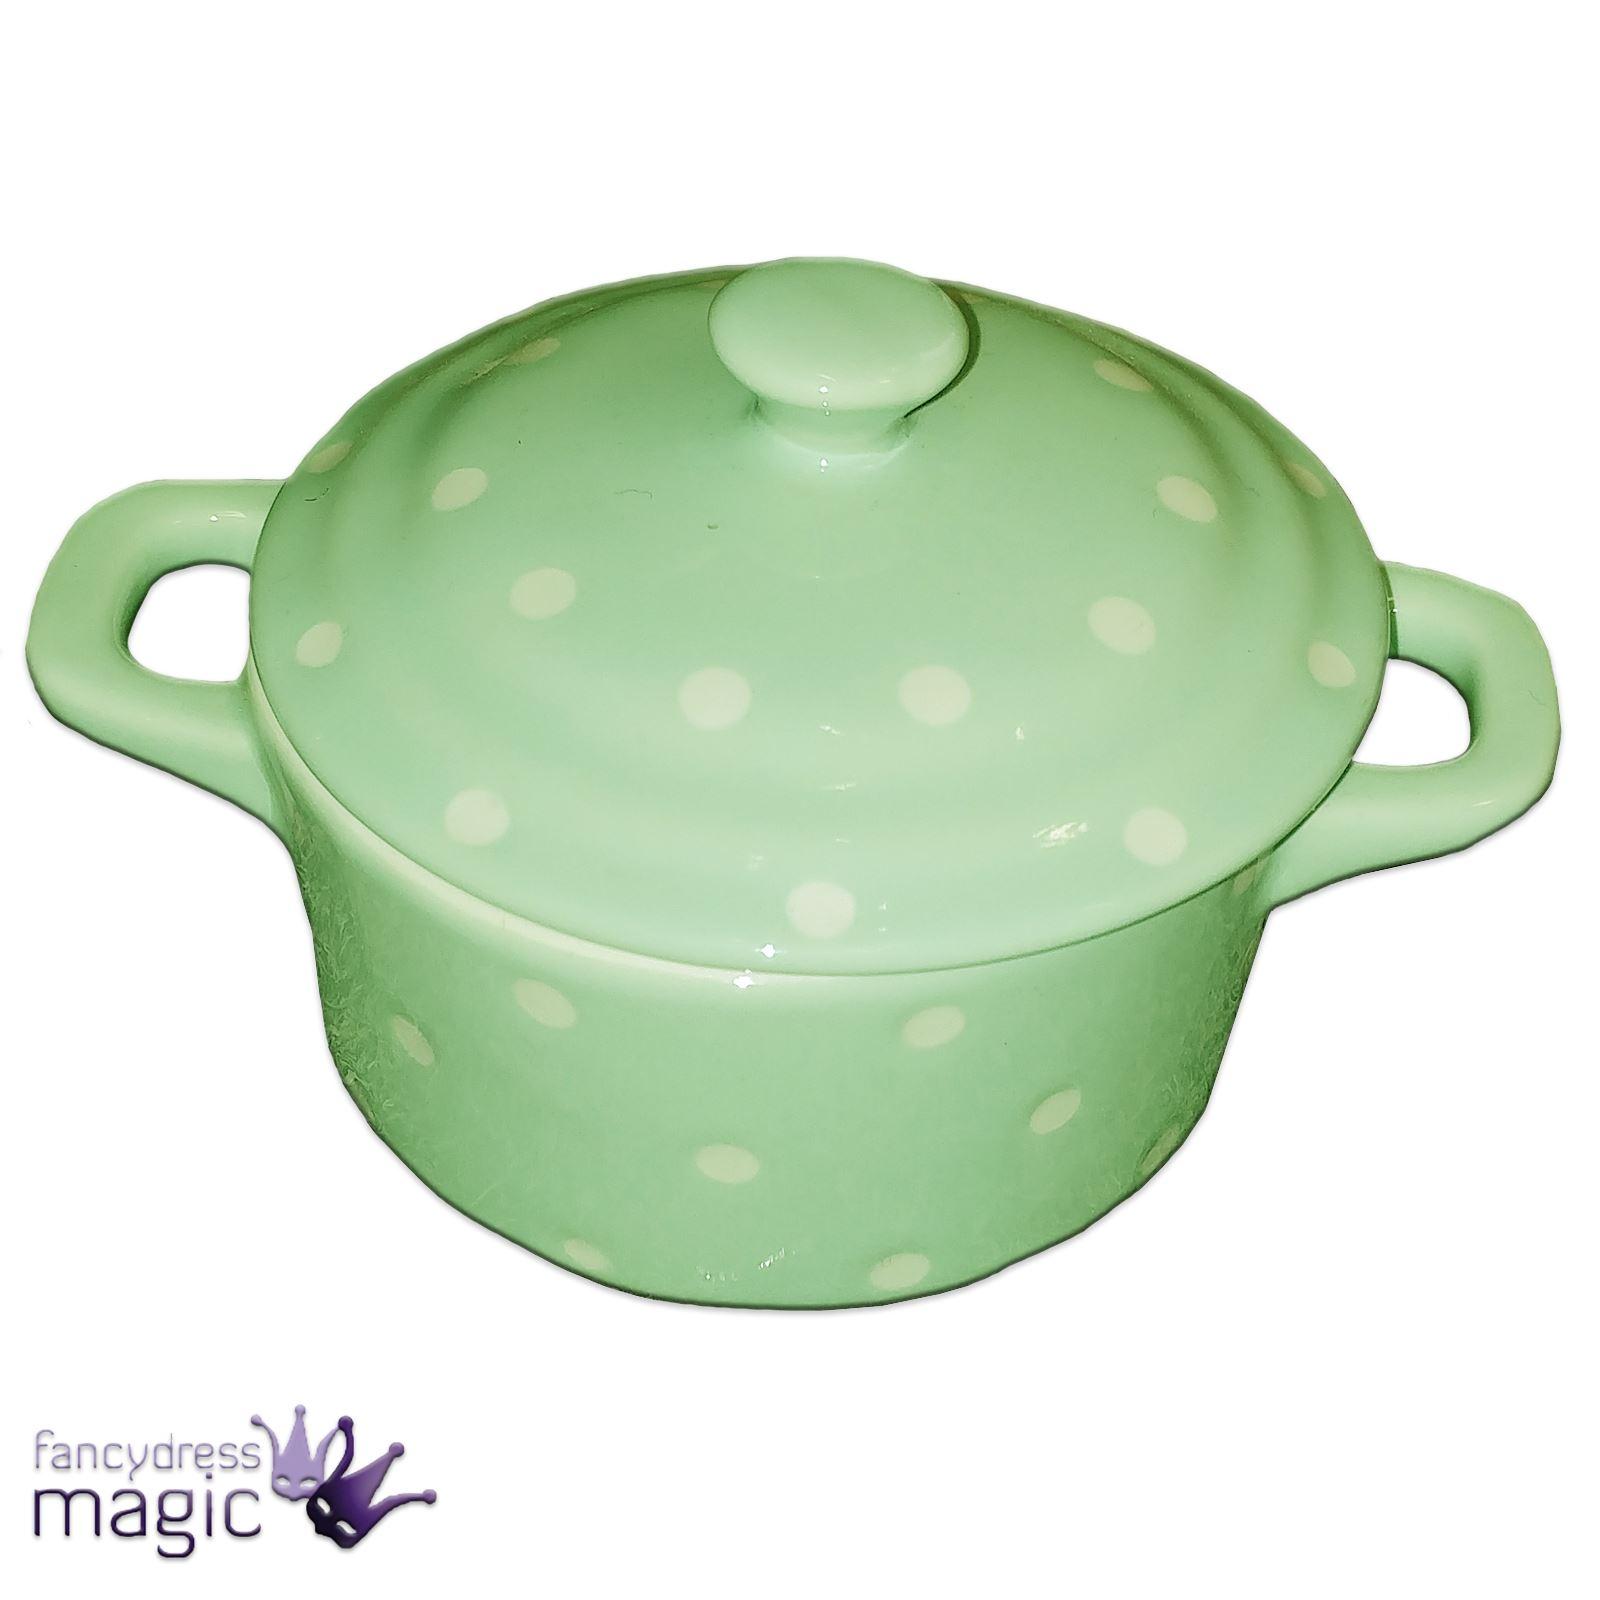 Gisela-Graham-Ceramica-pastel-de-topos-Cazuela-plato-amp-Tapa-Retro-Cocina-Hogar